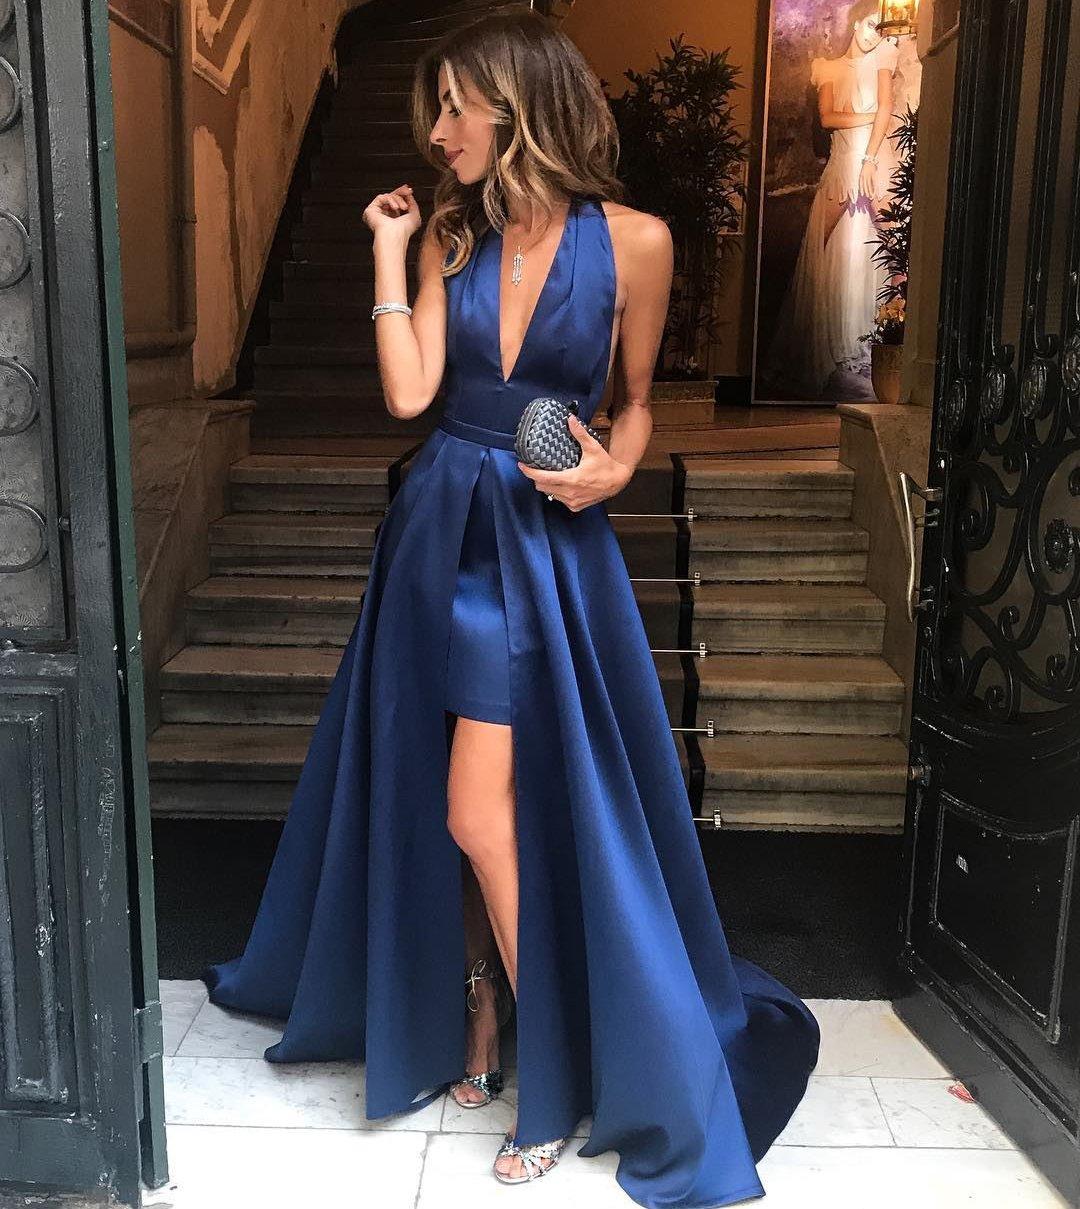 2c80152f4ad9c Chic Royal Blue Halter Deep V-Neck Long Prom Dresses,Satin A-Line ...